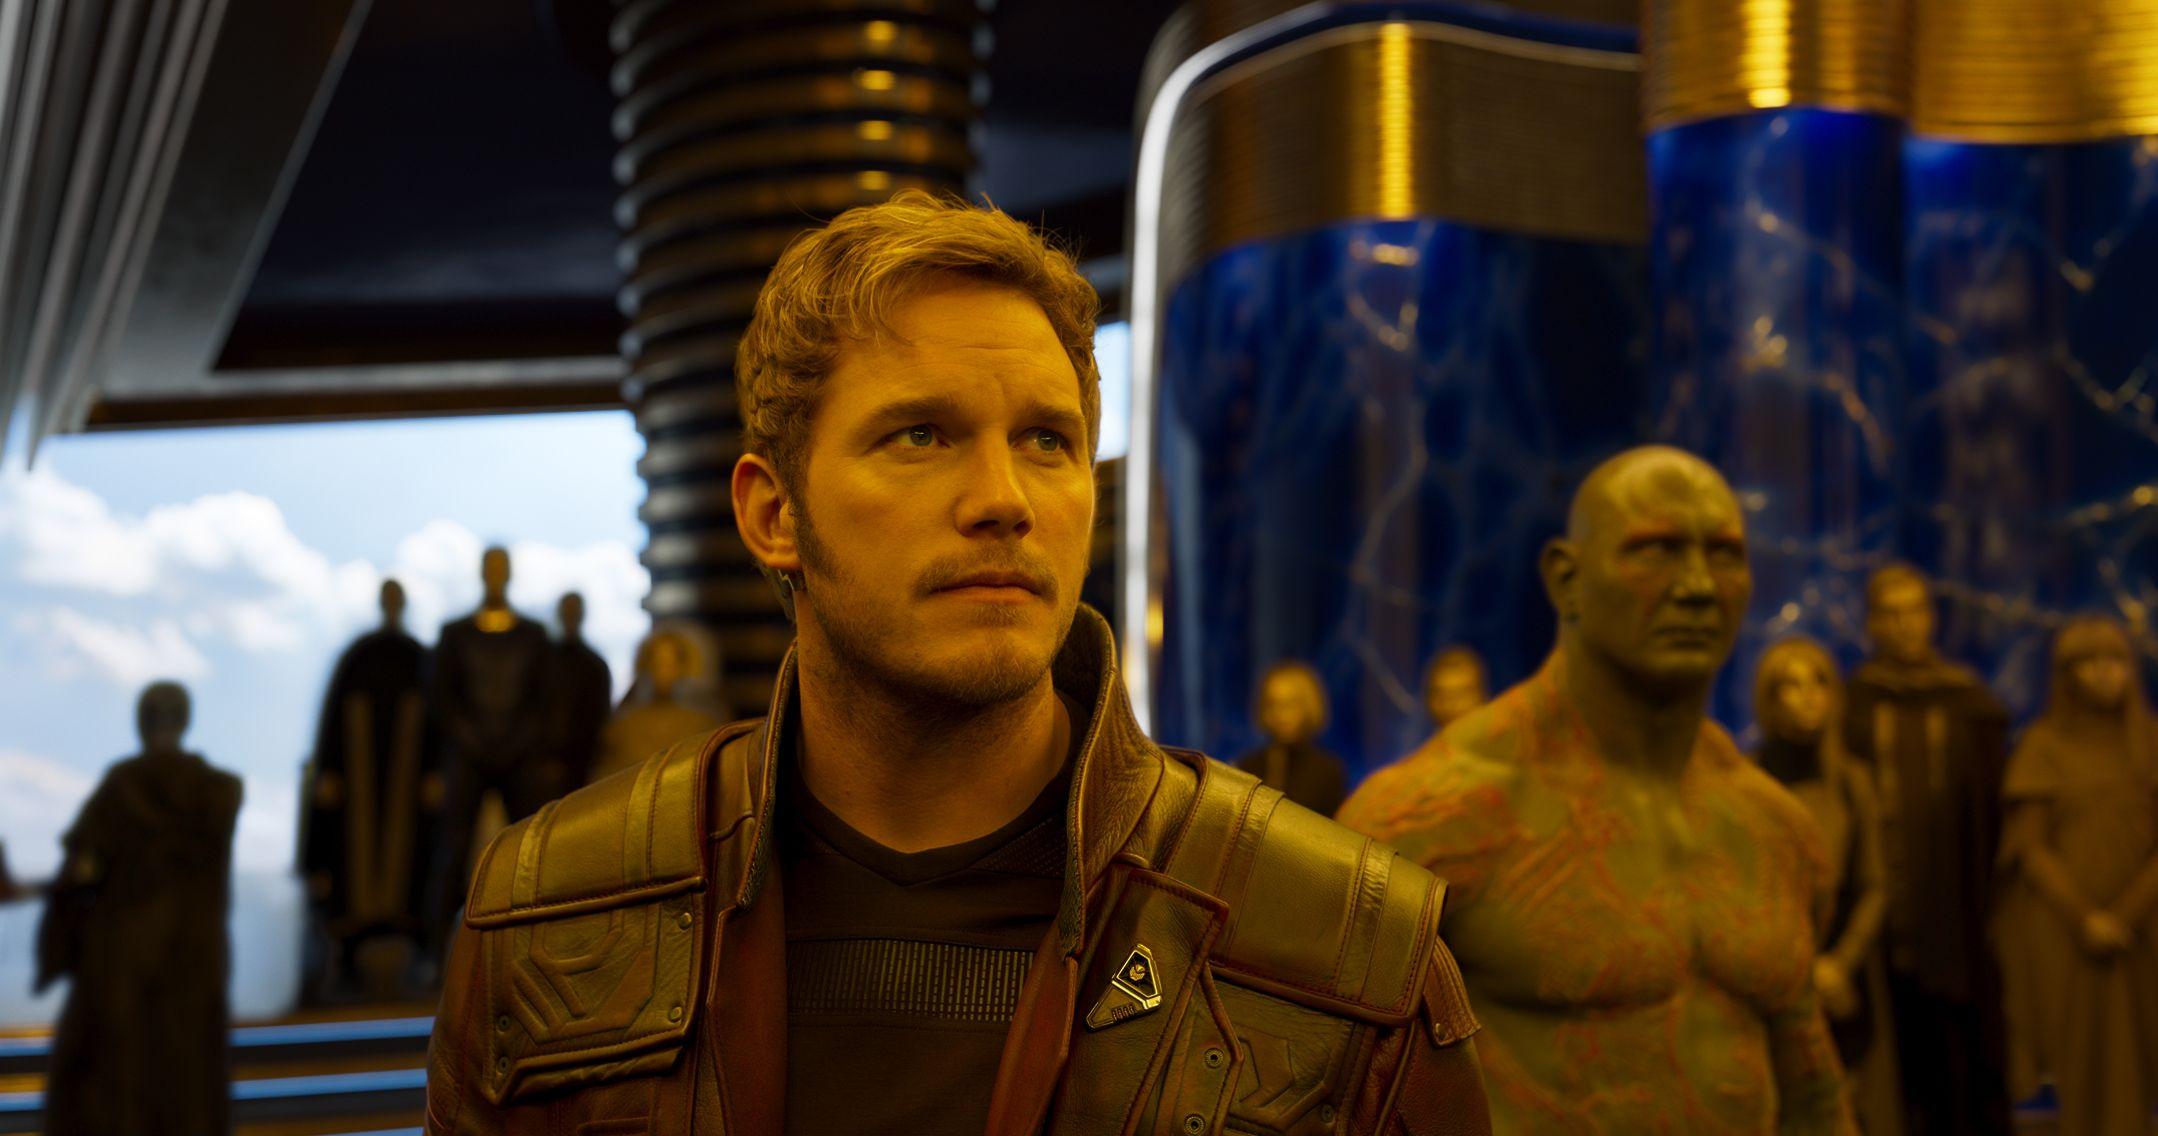 guardians-of-the-galaxy-2-image-chris-pratt-dave-bautista